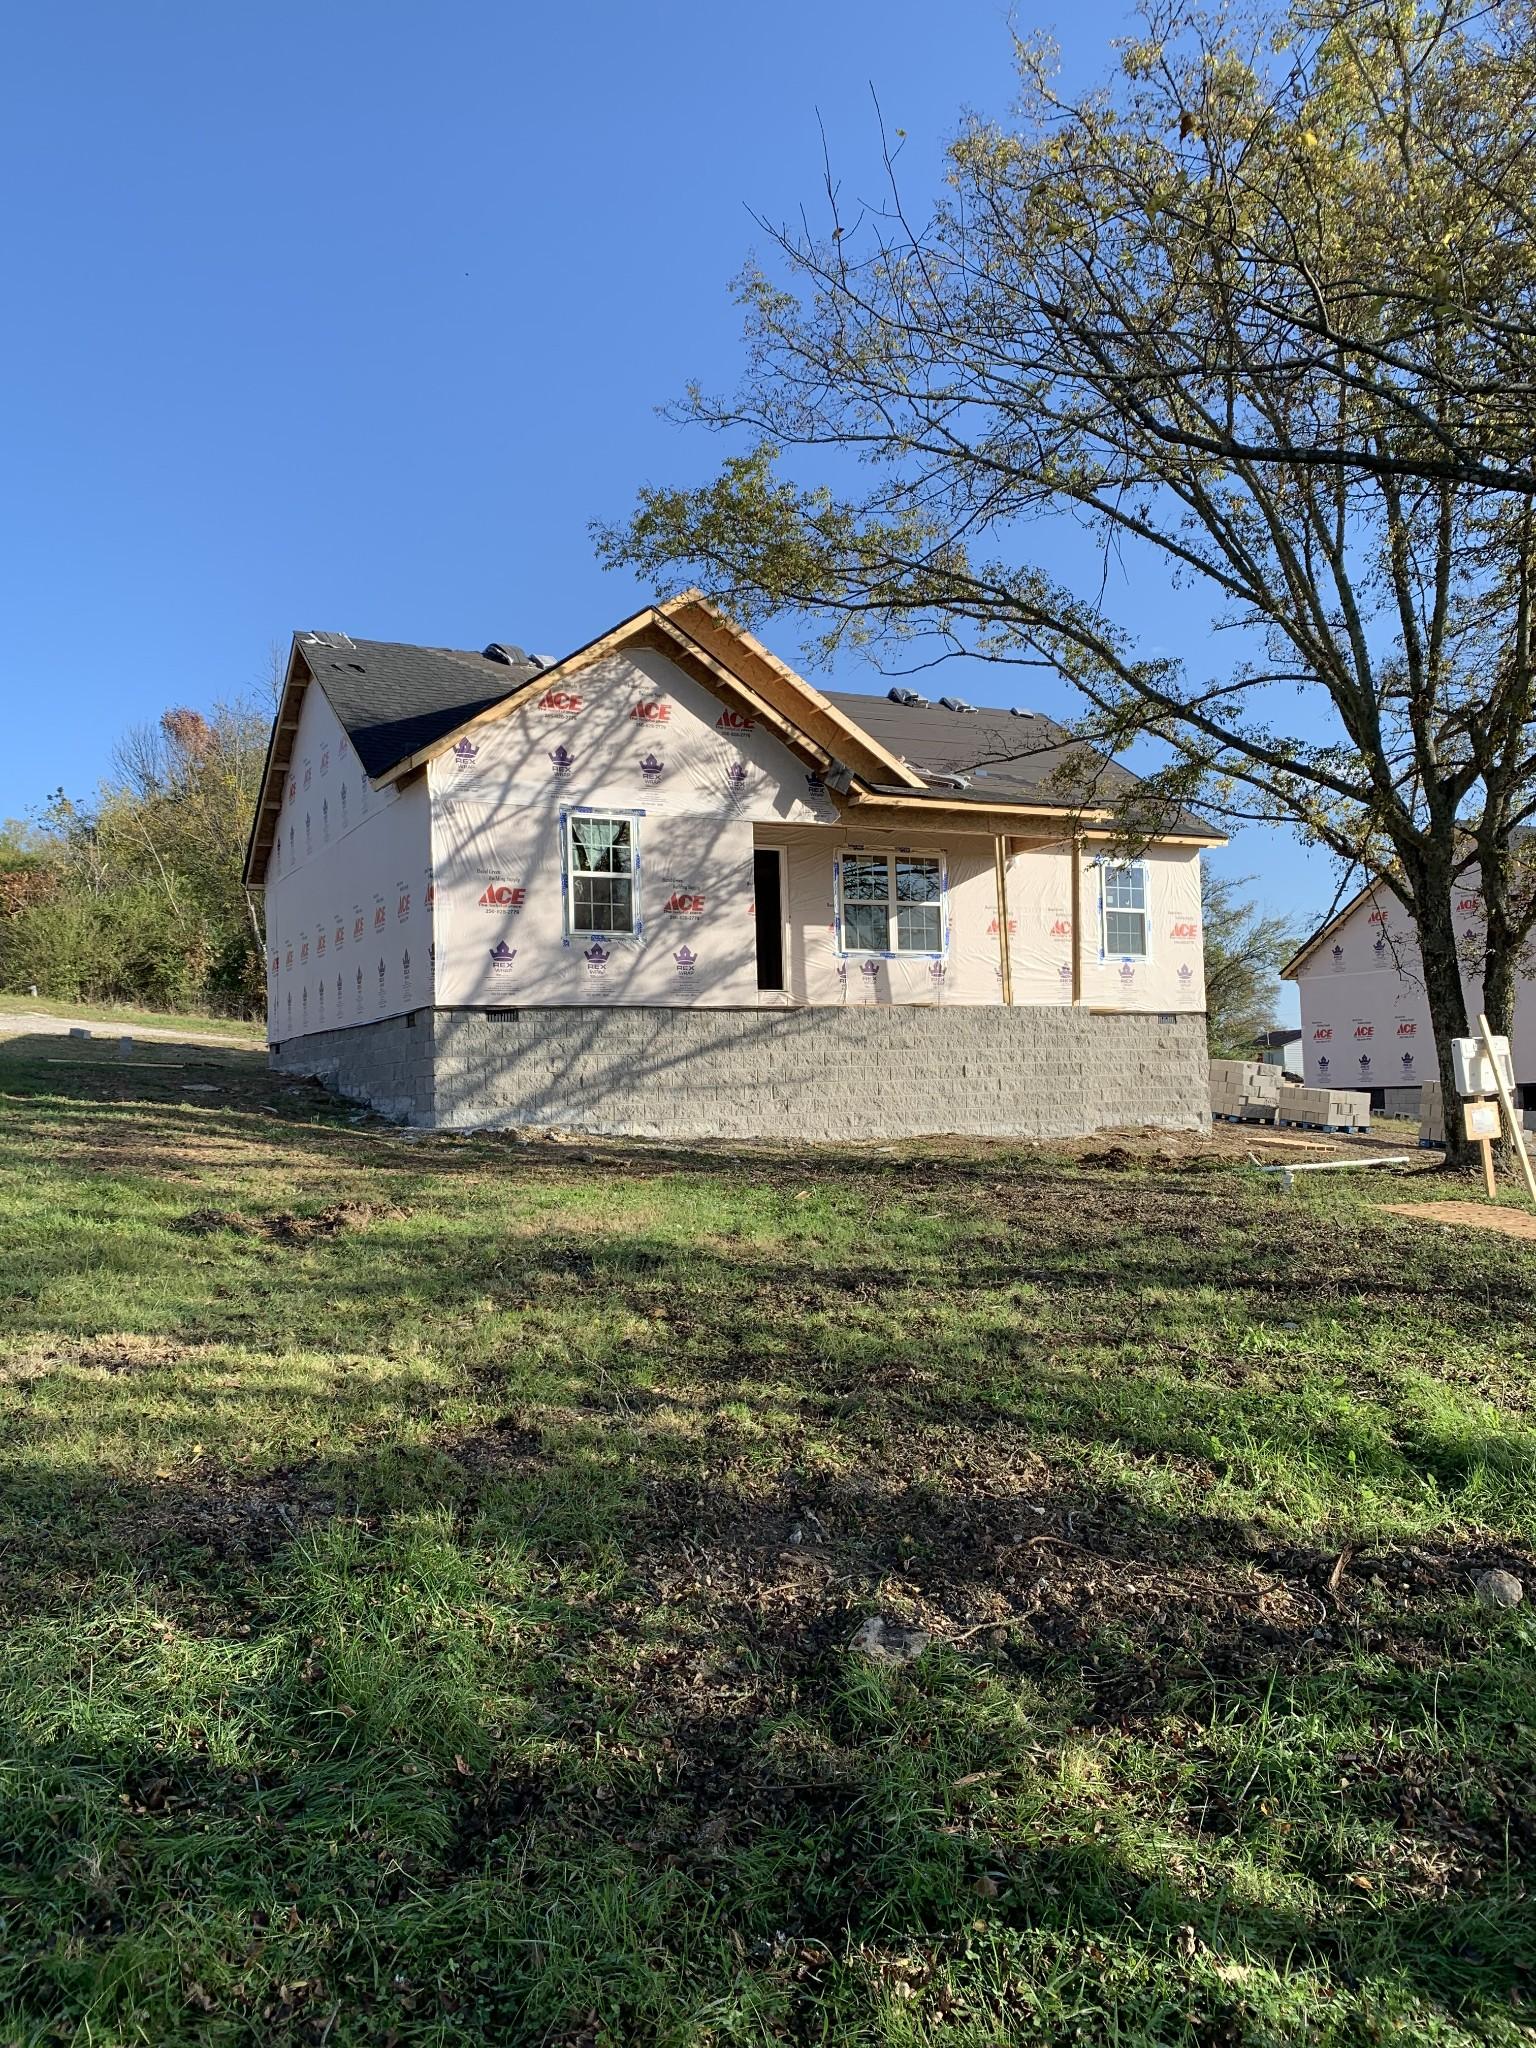 112 Fairview Property Photo - Cornersville, TN real estate listing